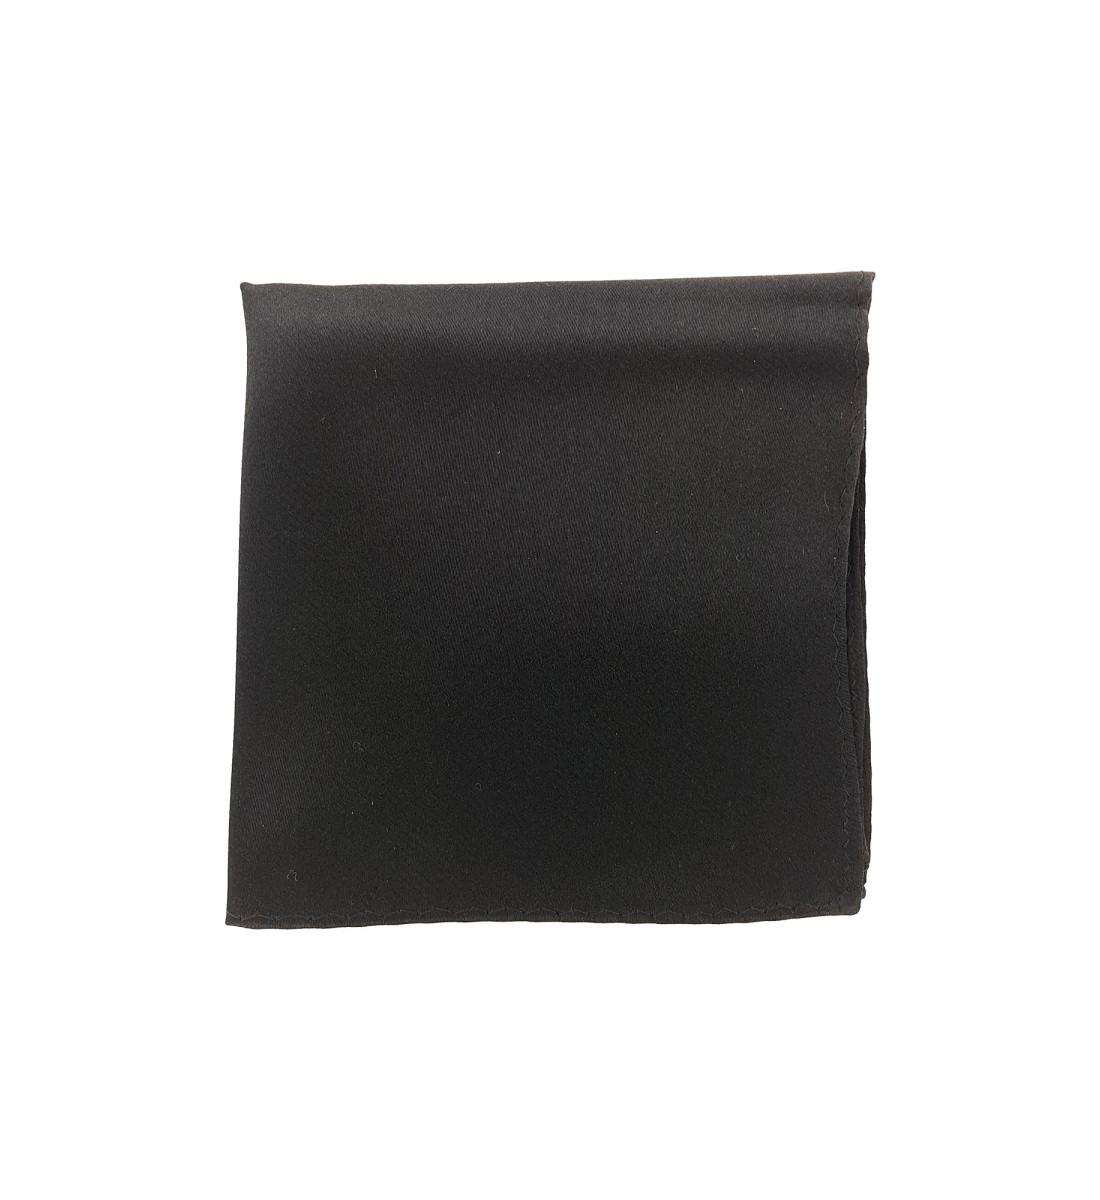 Pochette unie en soie NOIR